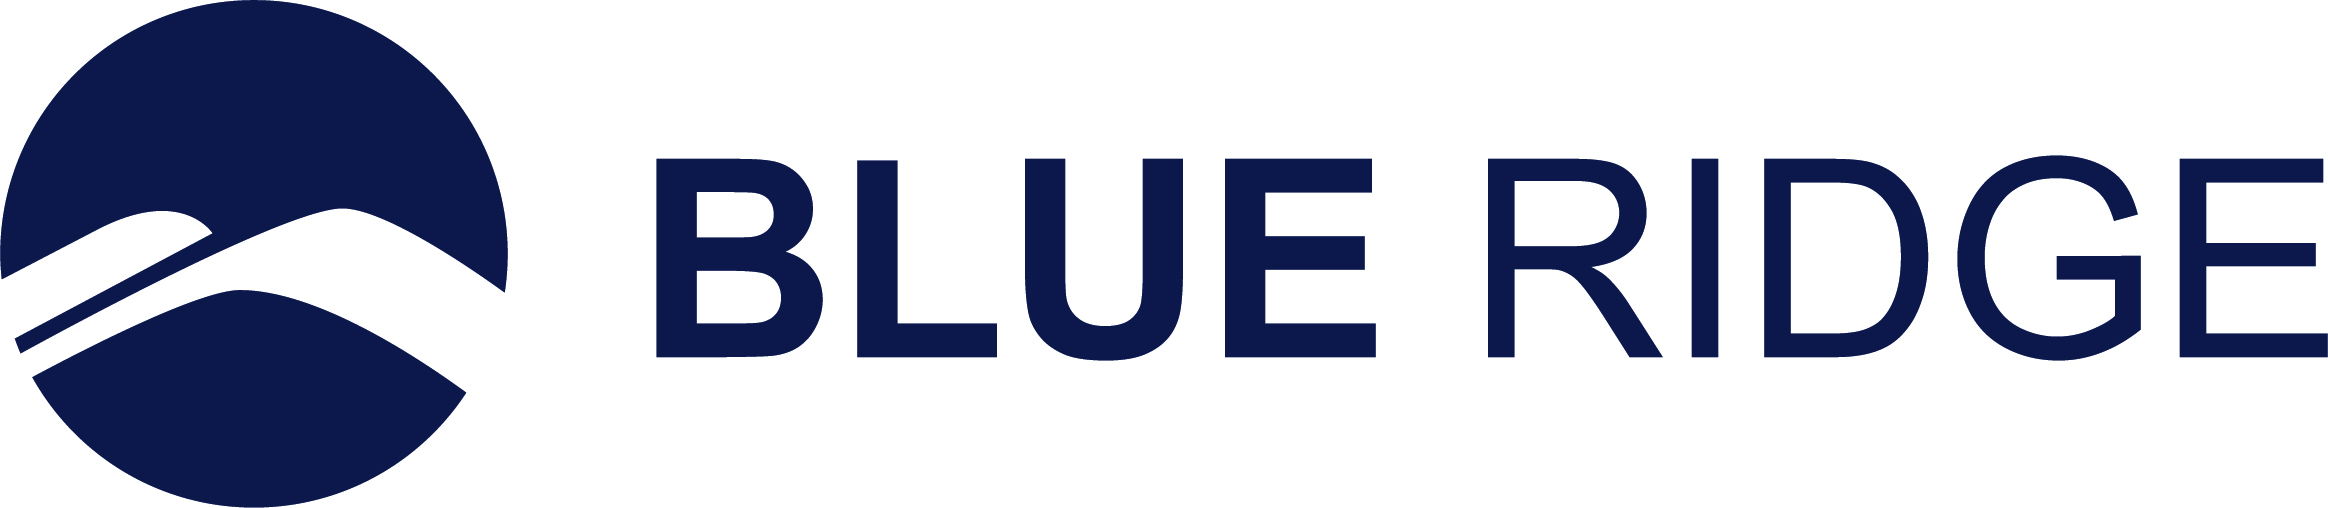 Tommy Mathews of Blue Ridge Speaks on Exception Management Optimization at BLUEPRINT Conference